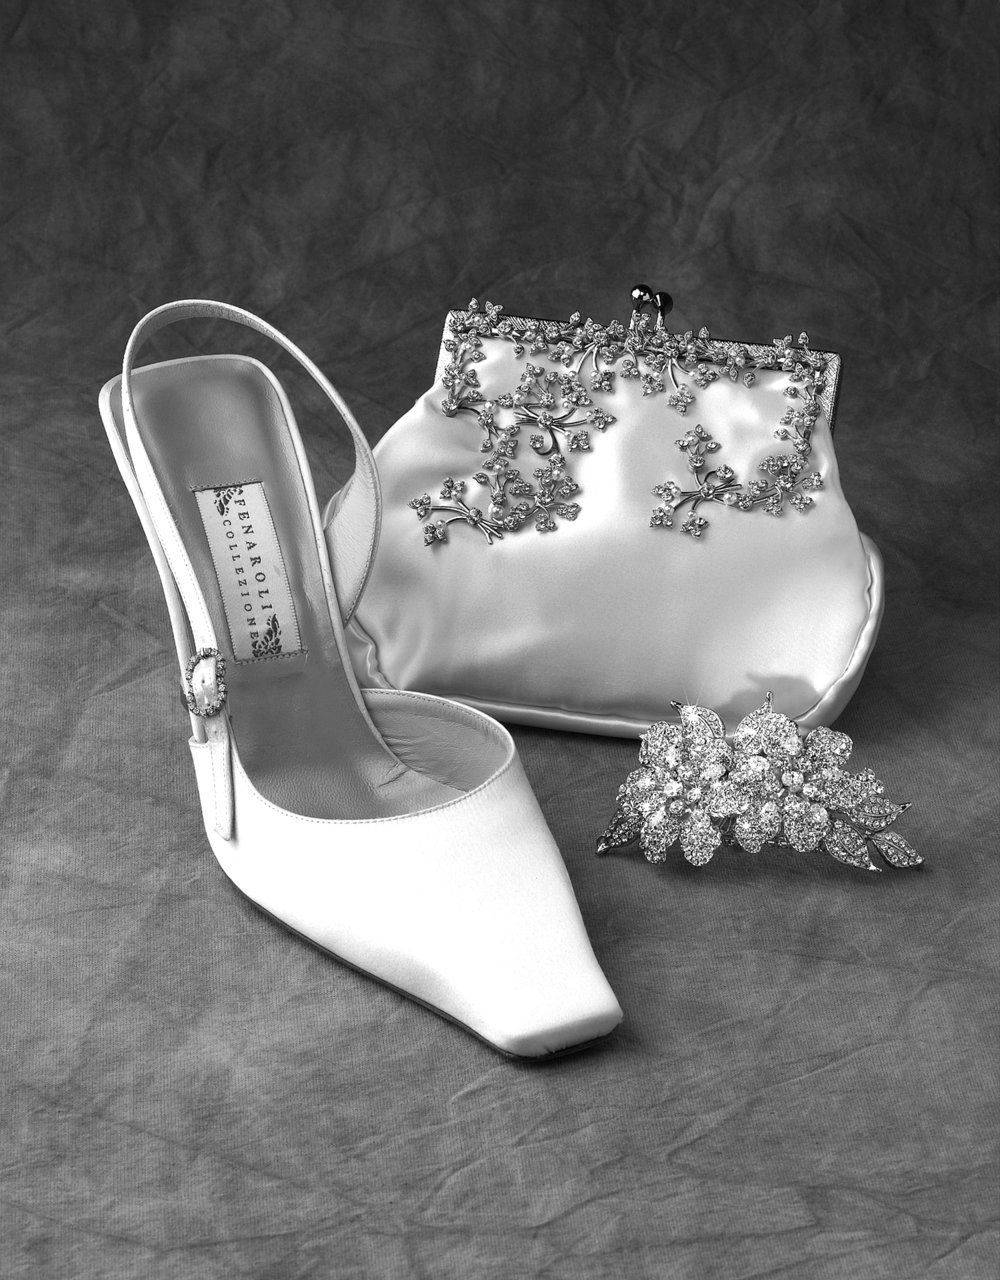 osp_wedding_accessories.jpg